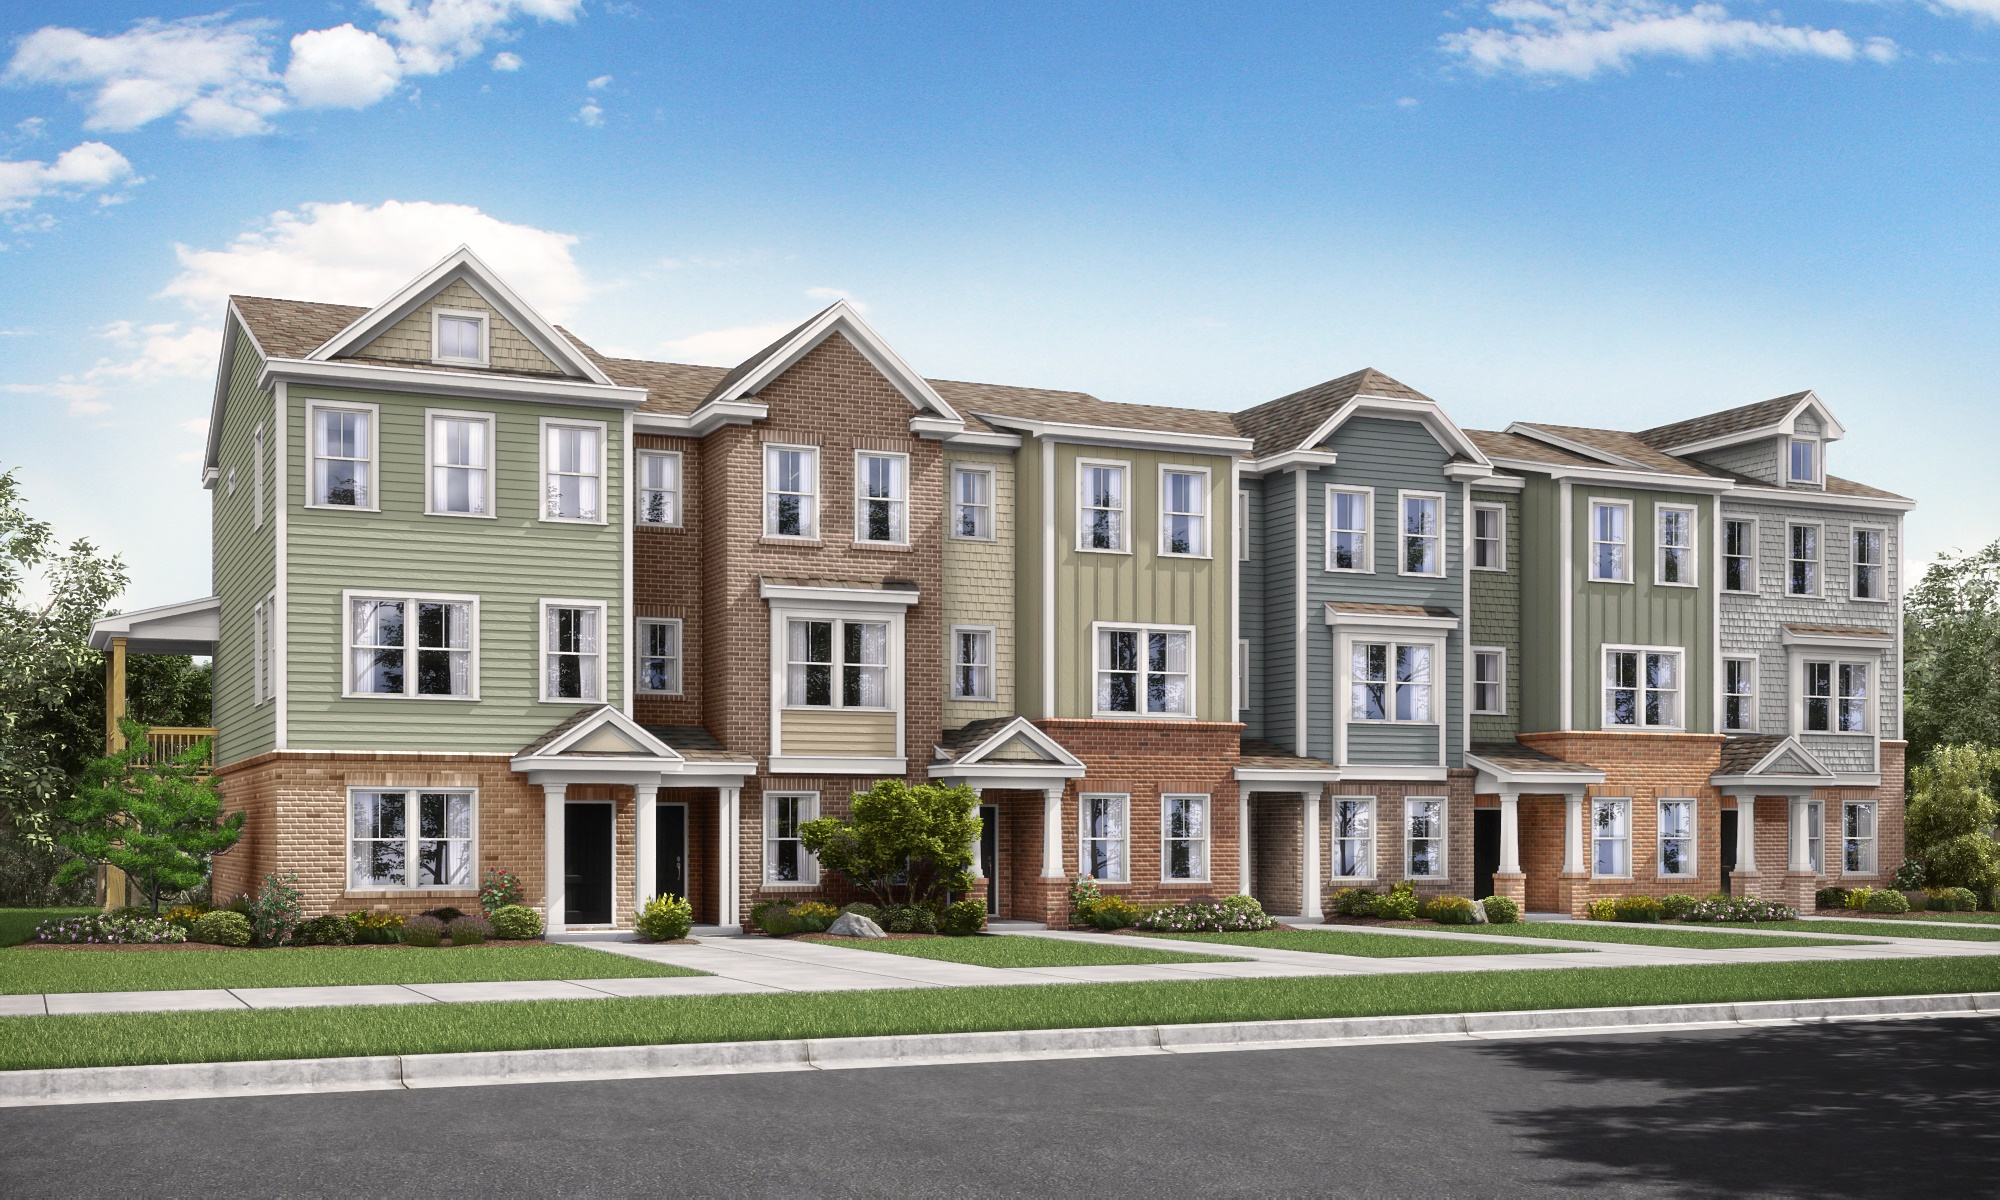 Level Homes - Raleigh - 5401 Townhome - 6 Plex_FINAL